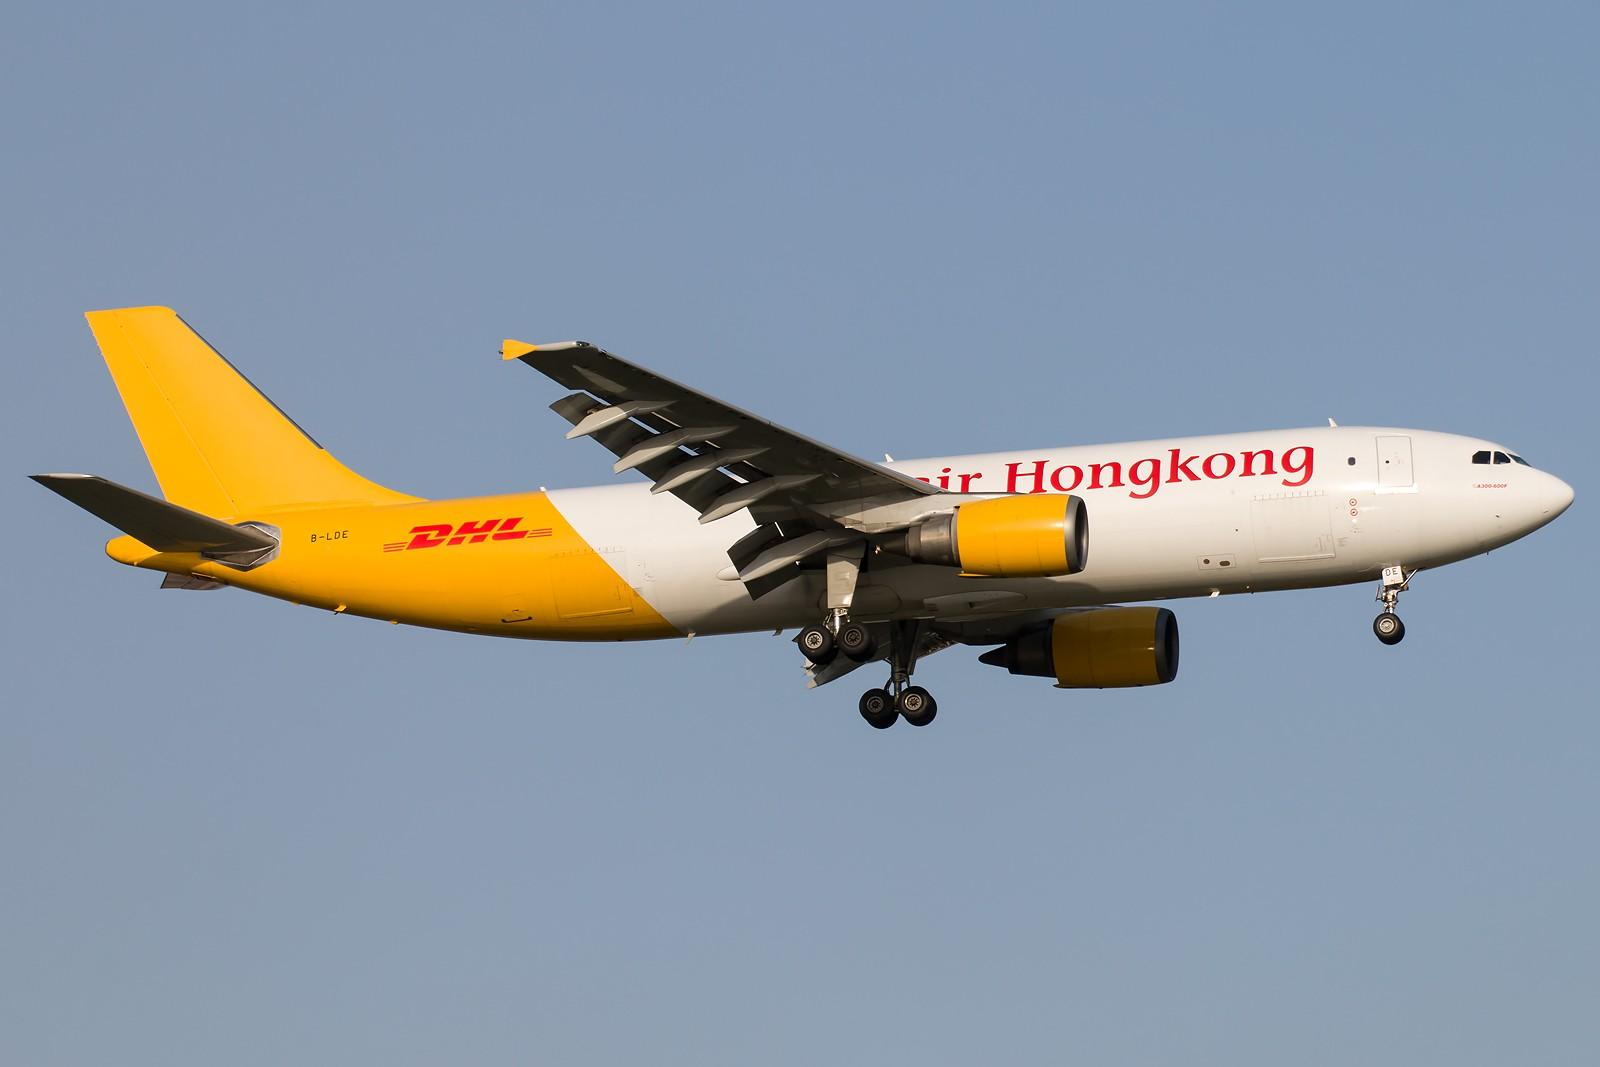 Re:[原创]晨练的季节到了 1600*1067 [8pics] AIRBUS A300F4-605R B-LDE 中国北京首都国际机场